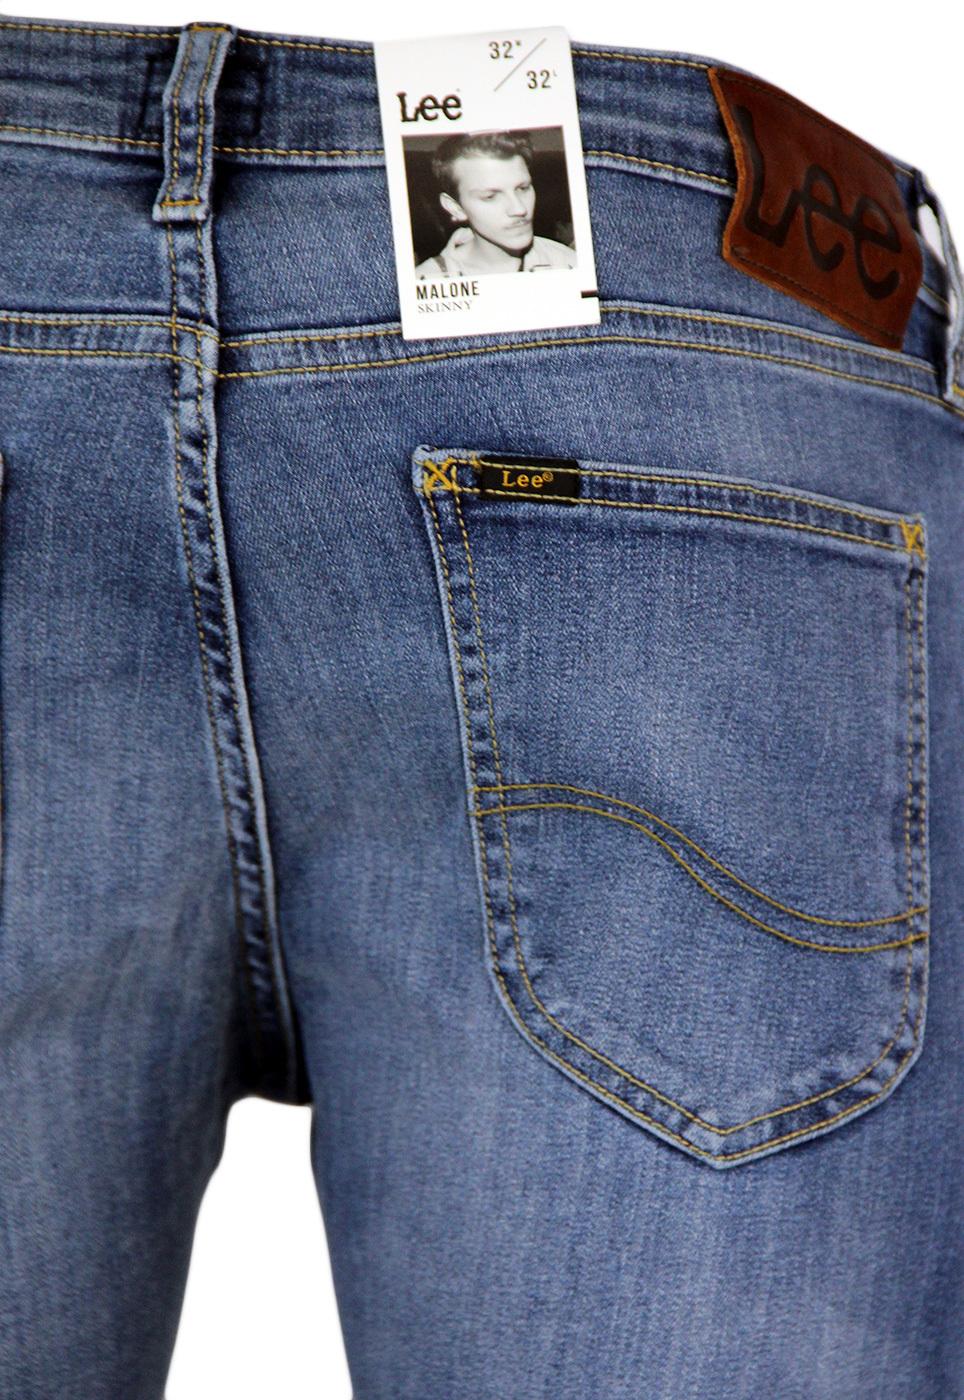 d354c313 LEE Malone Retro Indie Mod Skinny Denim Jeans in Common Blue